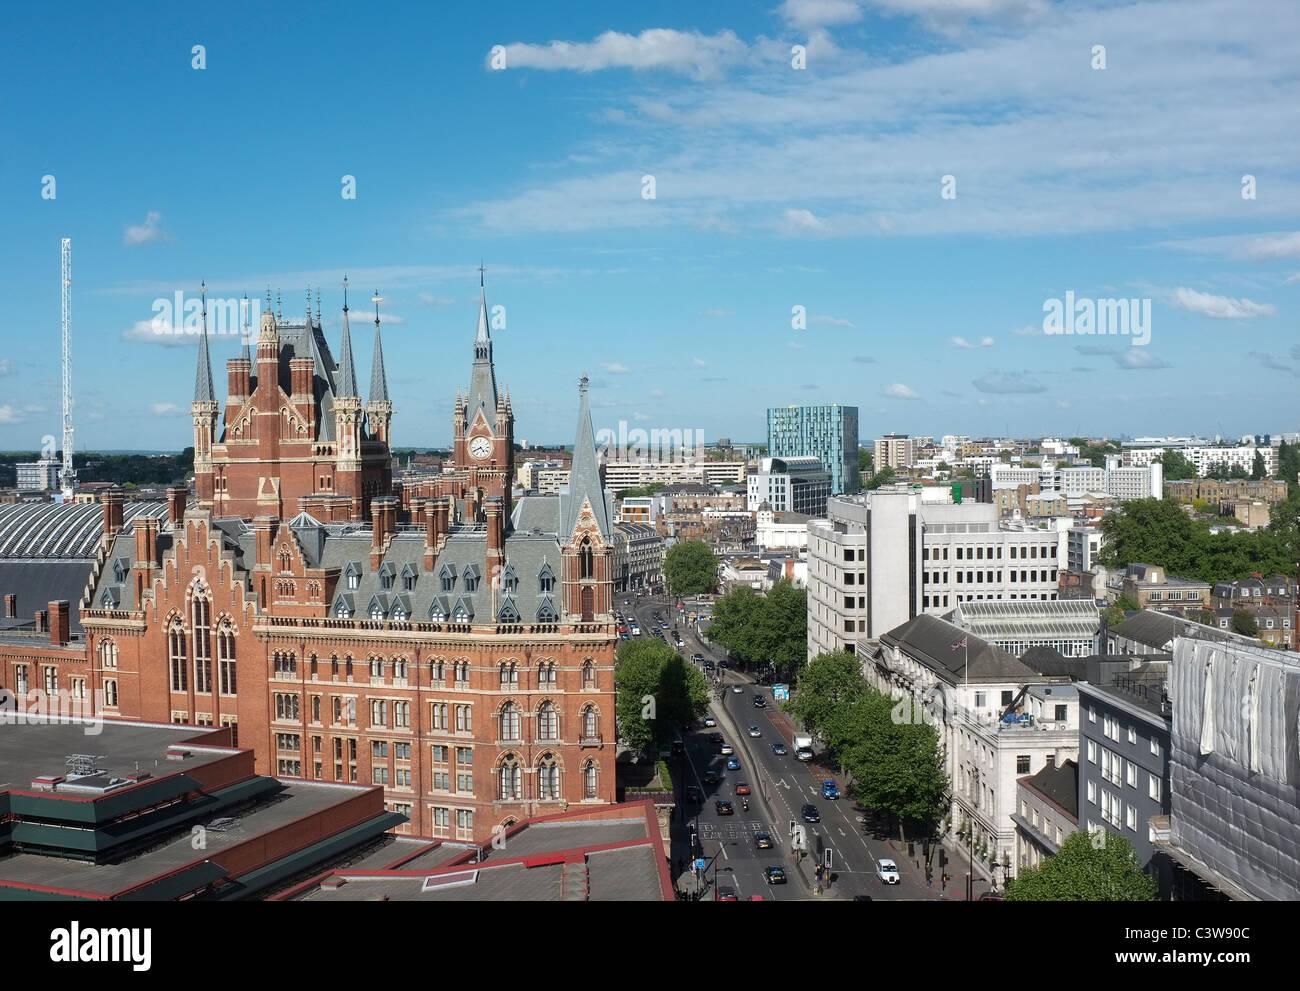 St Pancras Station London - 1 - Stock Image